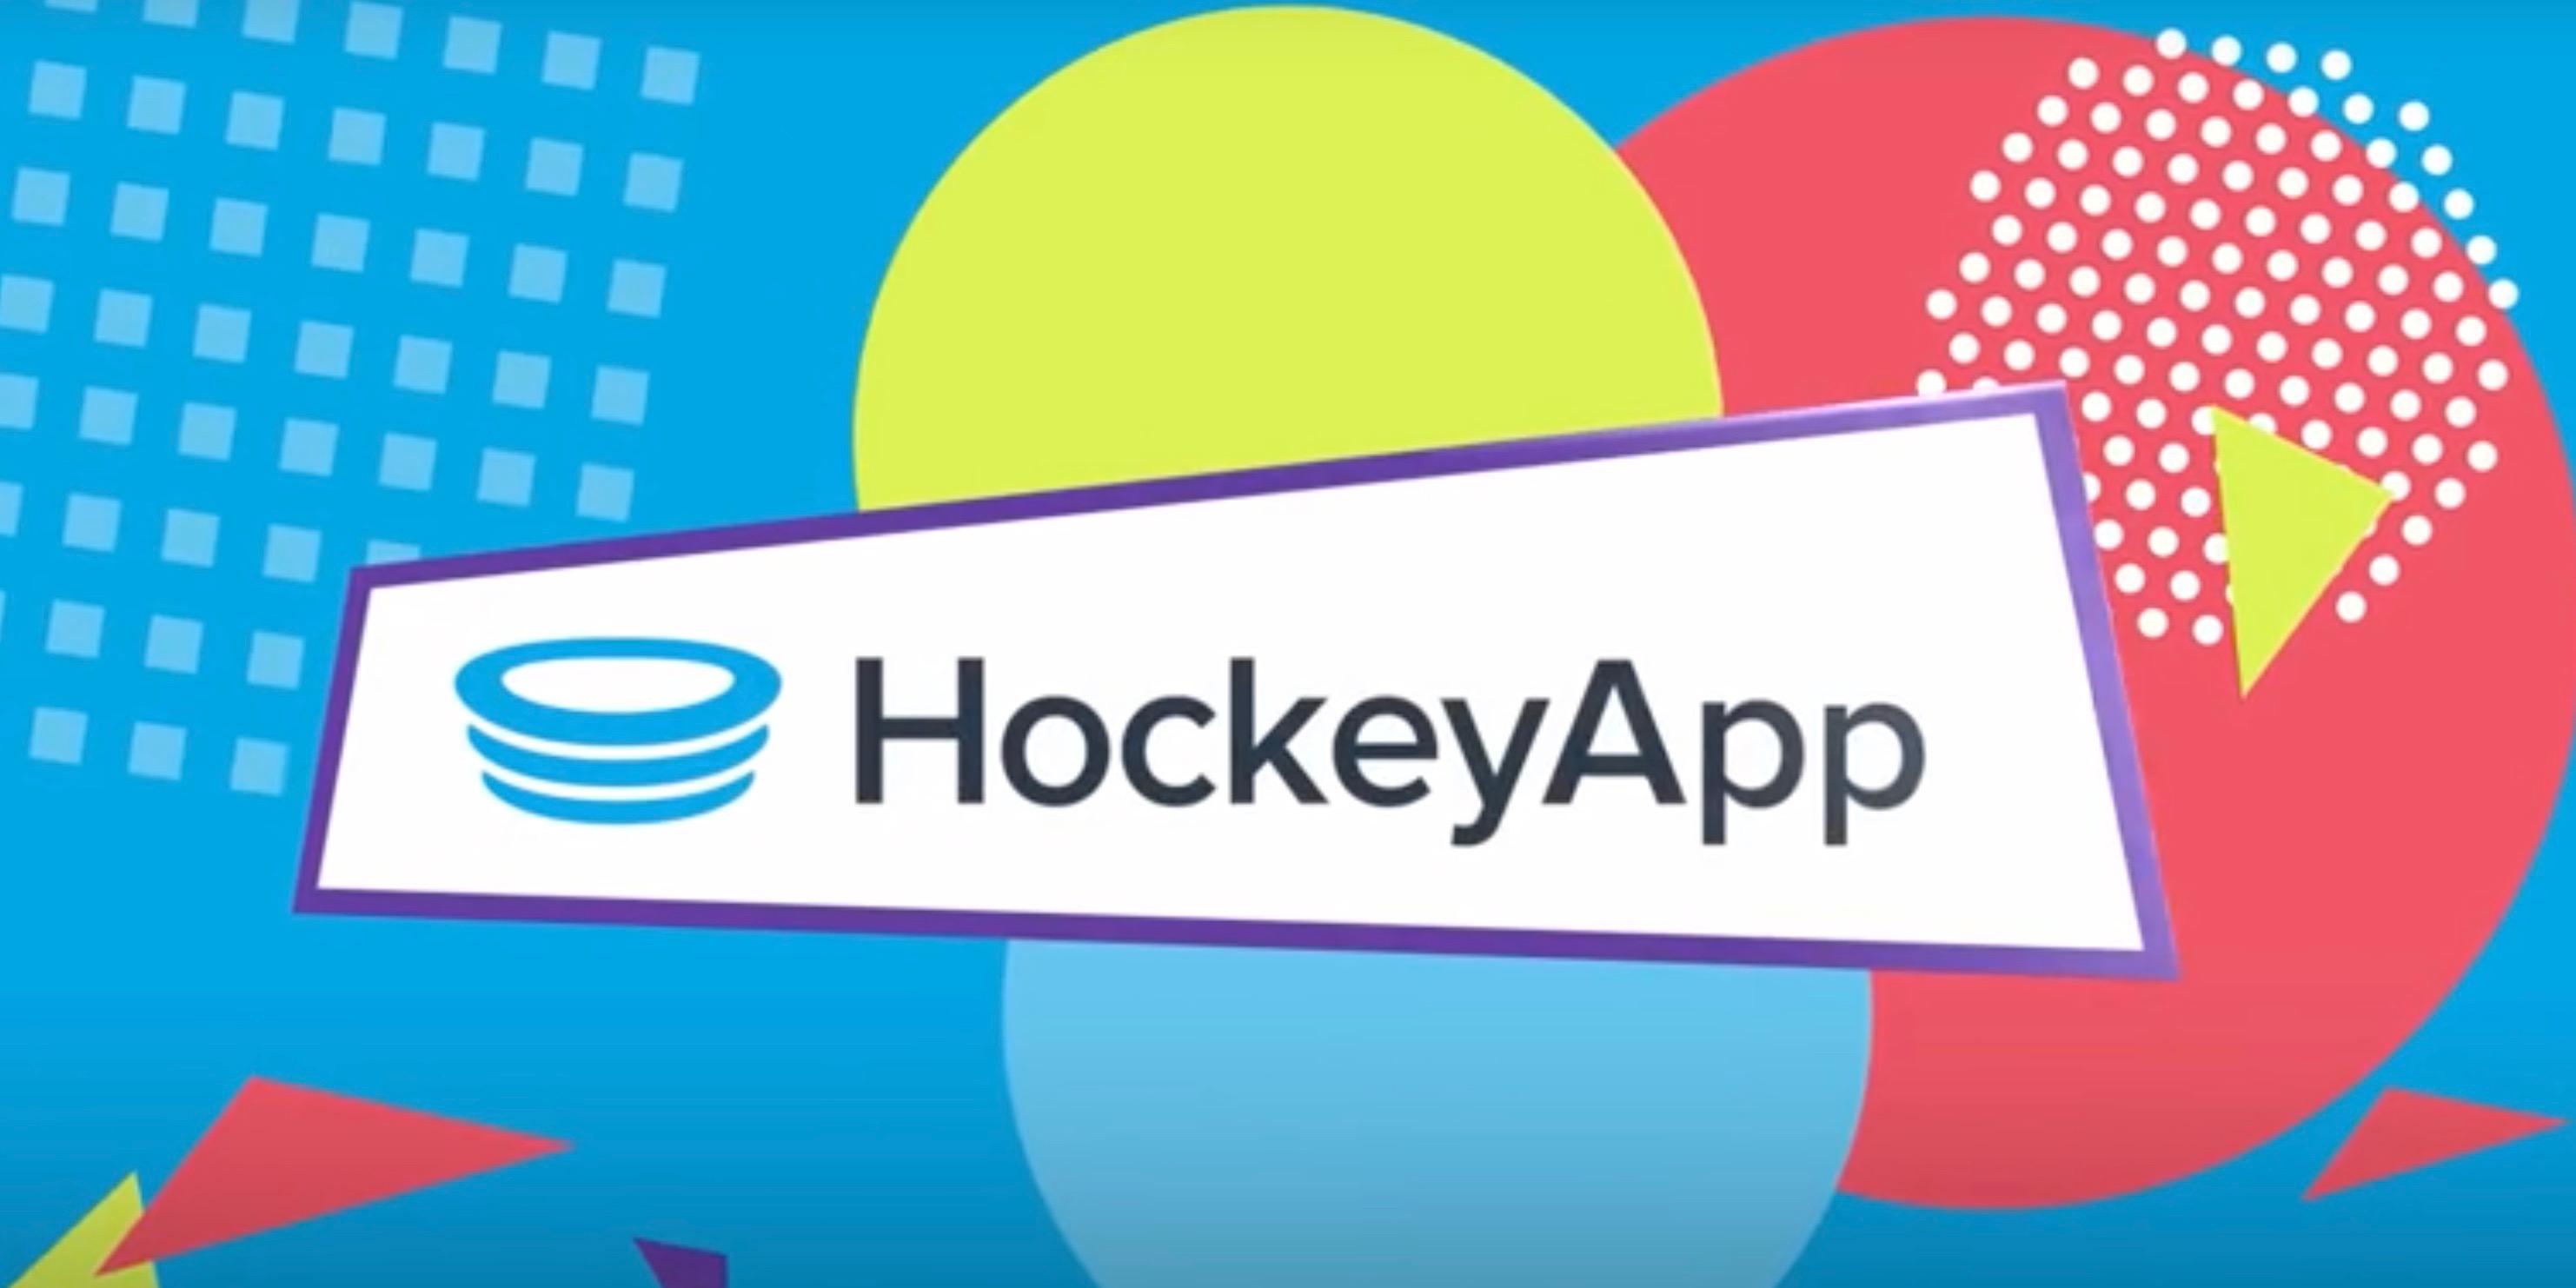 Microsoft deprecating HockeyApp multi-platform development tool, gives devs one year to transition